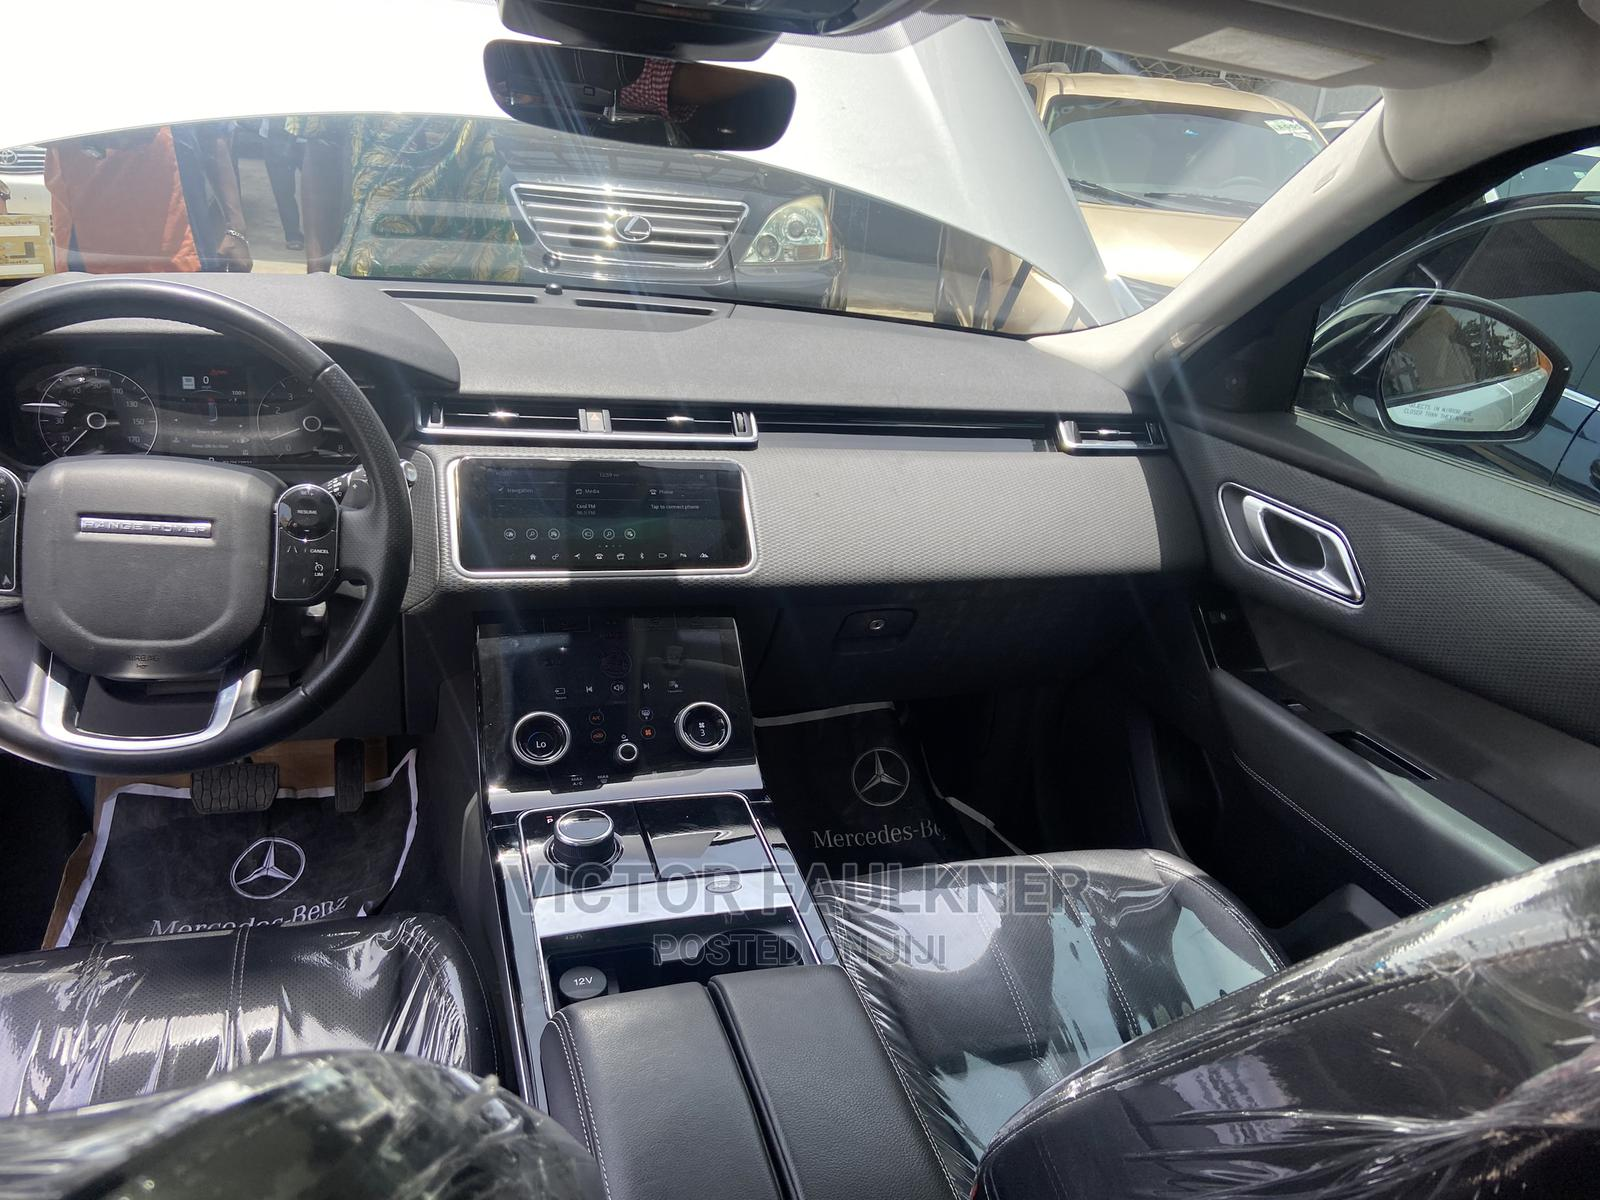 Archive: Land Rover Range Rover Velar 2018 D180 HSE R-Dynamic 4x4 Silver